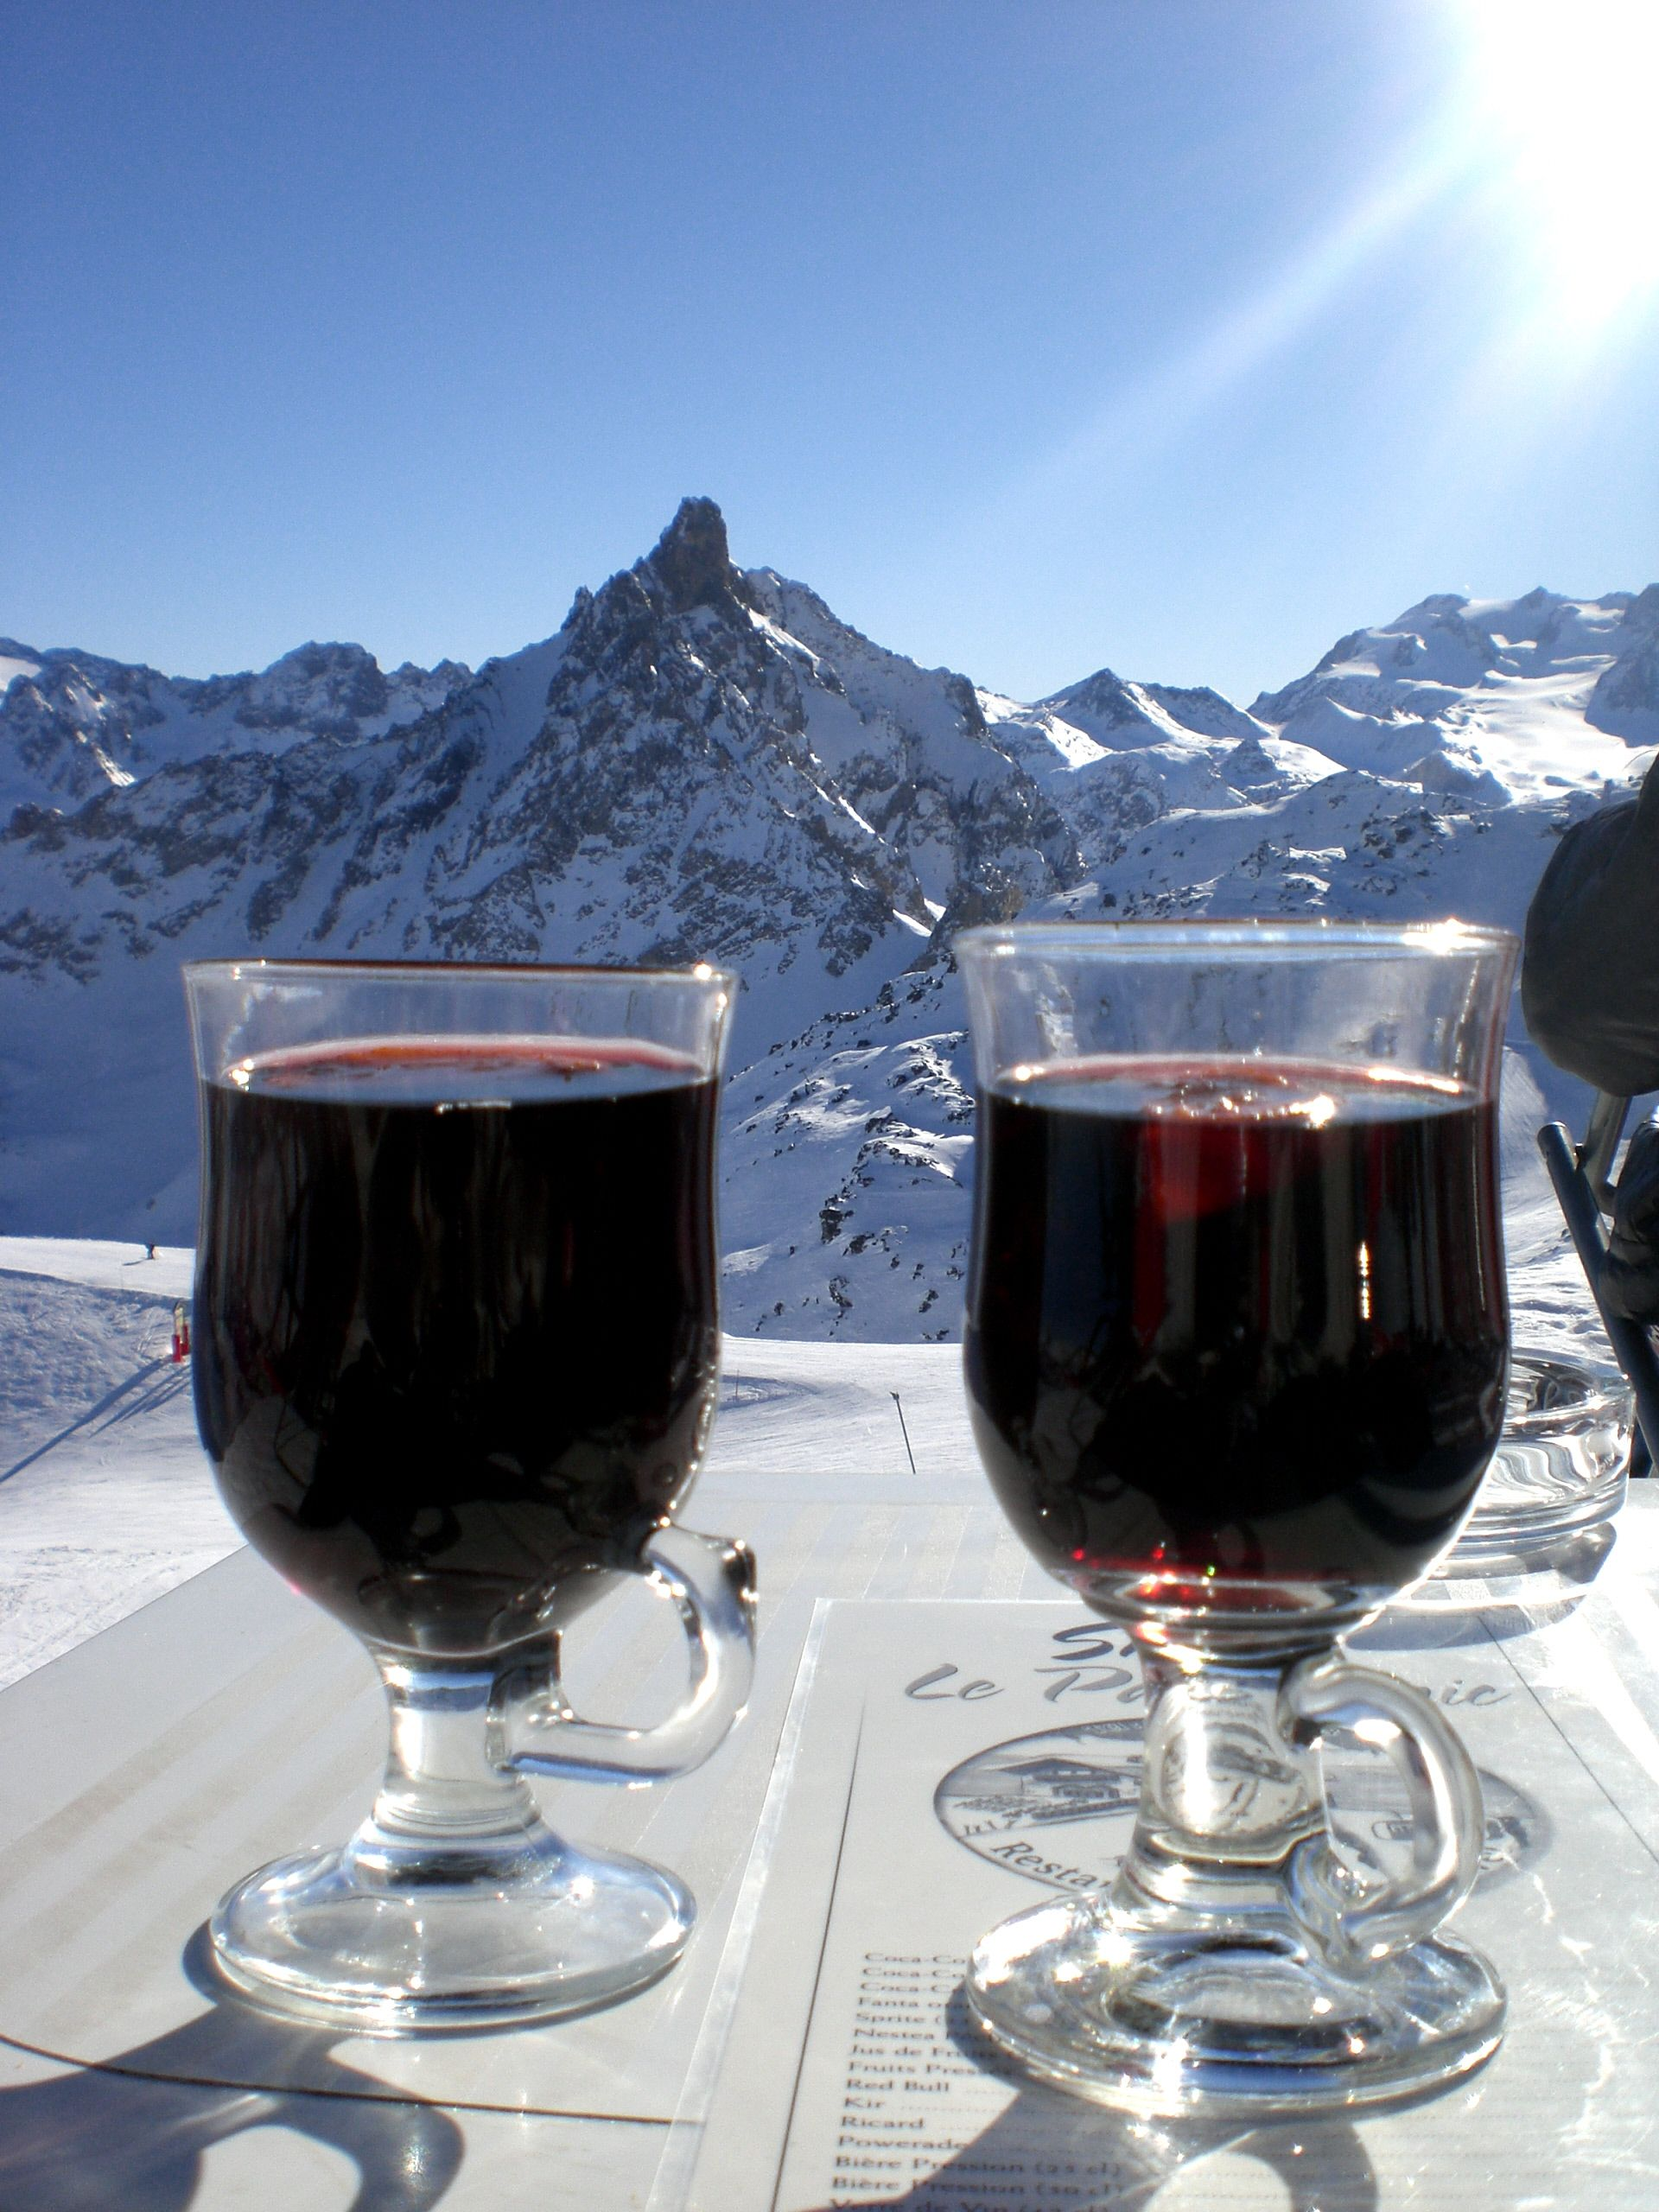 Mulled Wine At Courchevel France Apres Ski Ski Vin Chaud